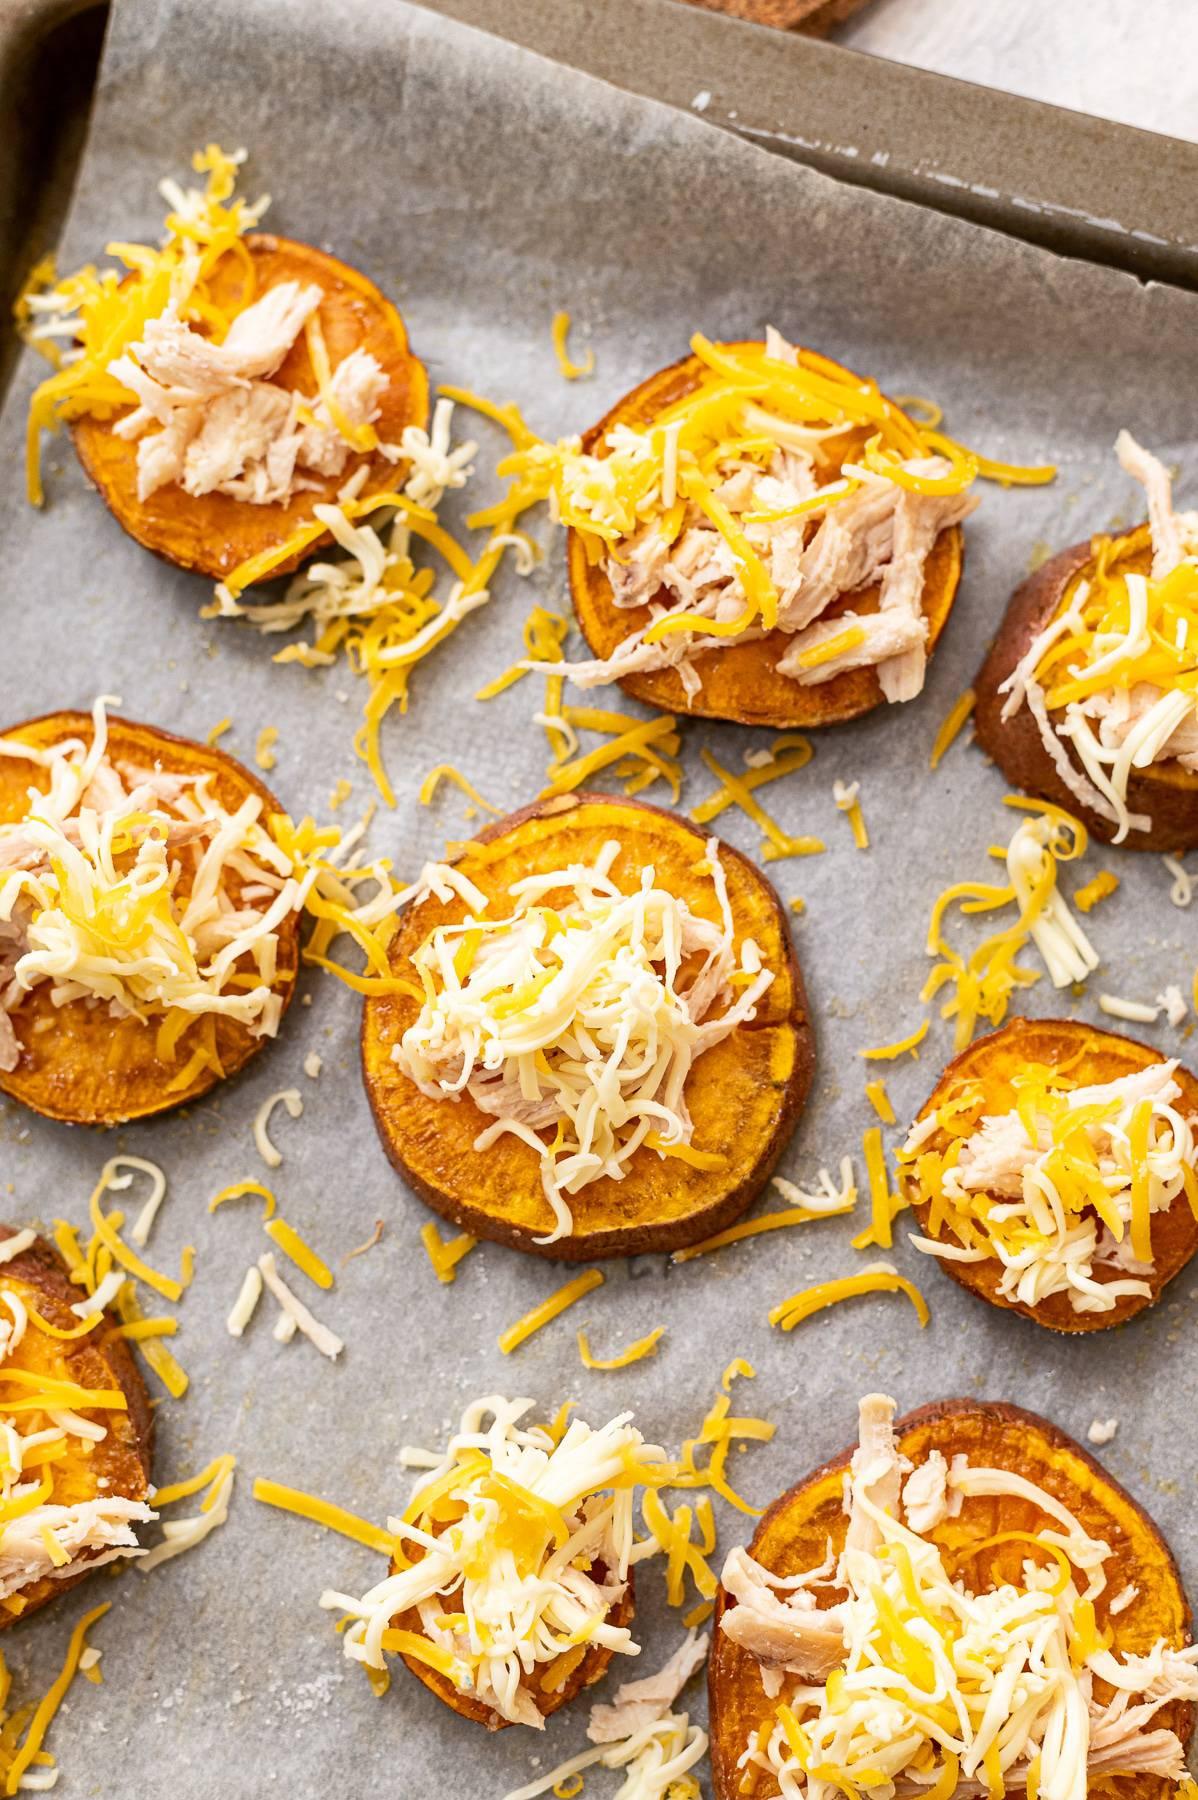 A tray of nacho sweet potato sliders.